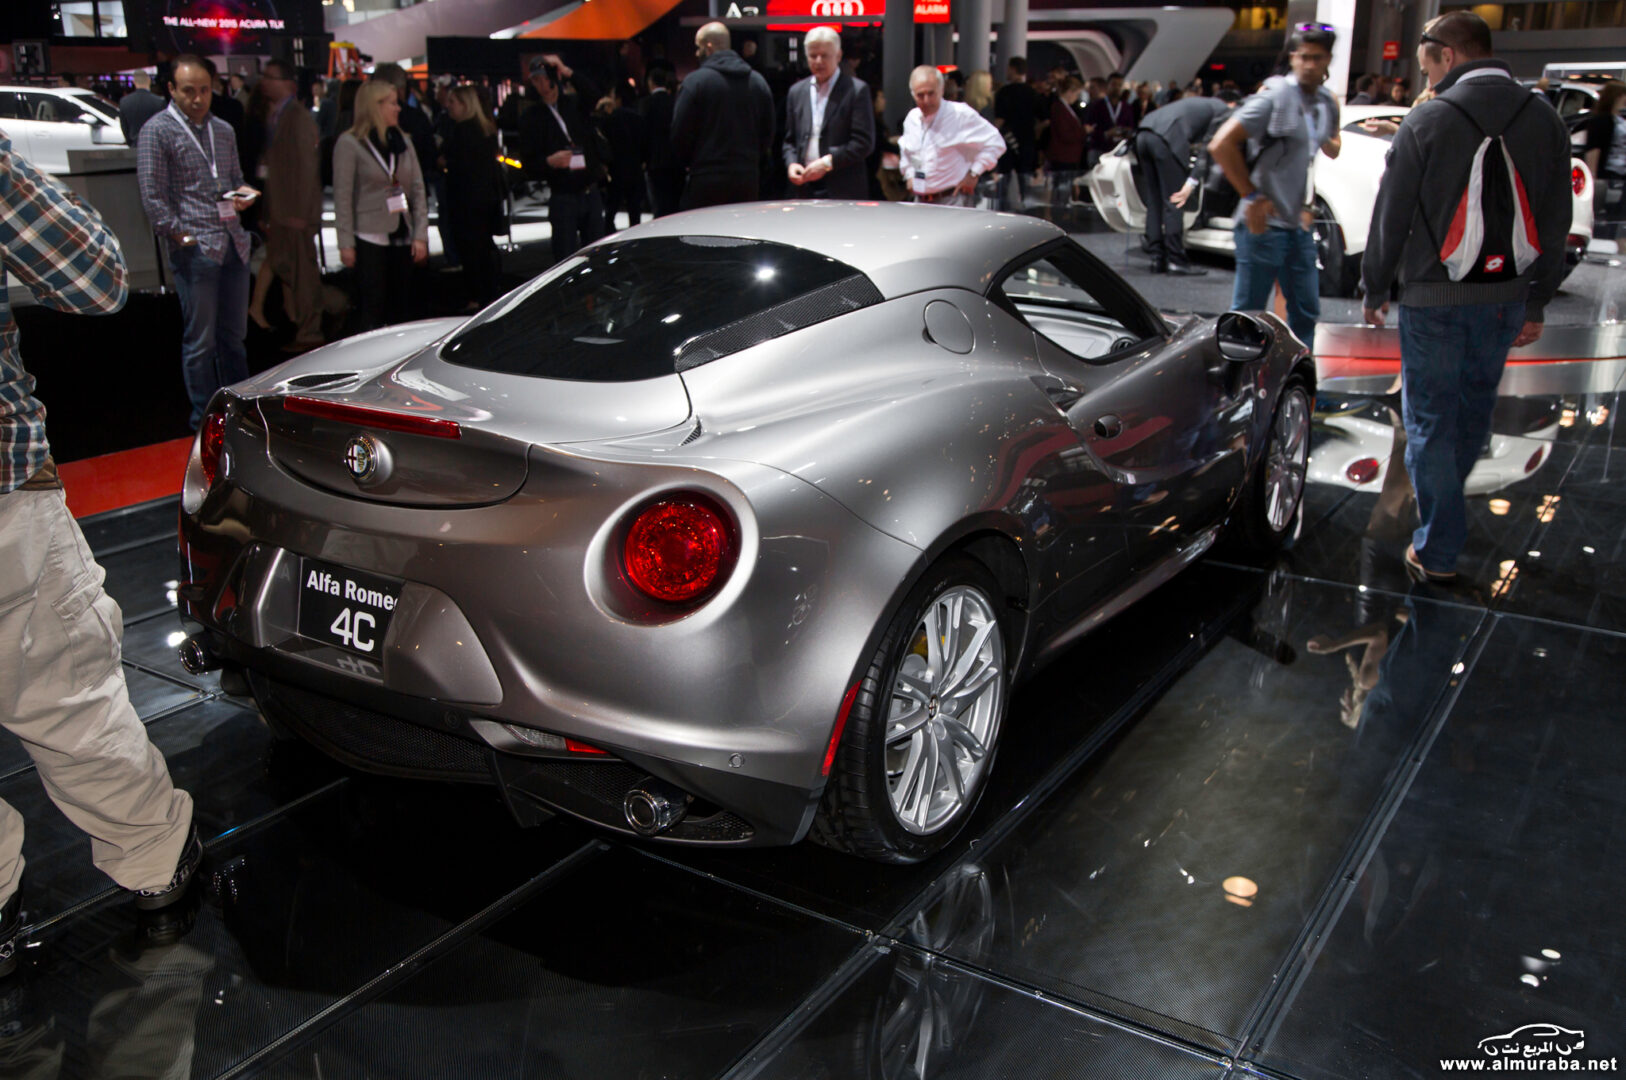 http---image.motortrend.com-f-wot-1404_2015_alfa_romeo_4c_launch_edition_arrives_this_june-72848103-2015-Alfa-Romeo-4C-Launch-Edition-rear-three-quarters-03